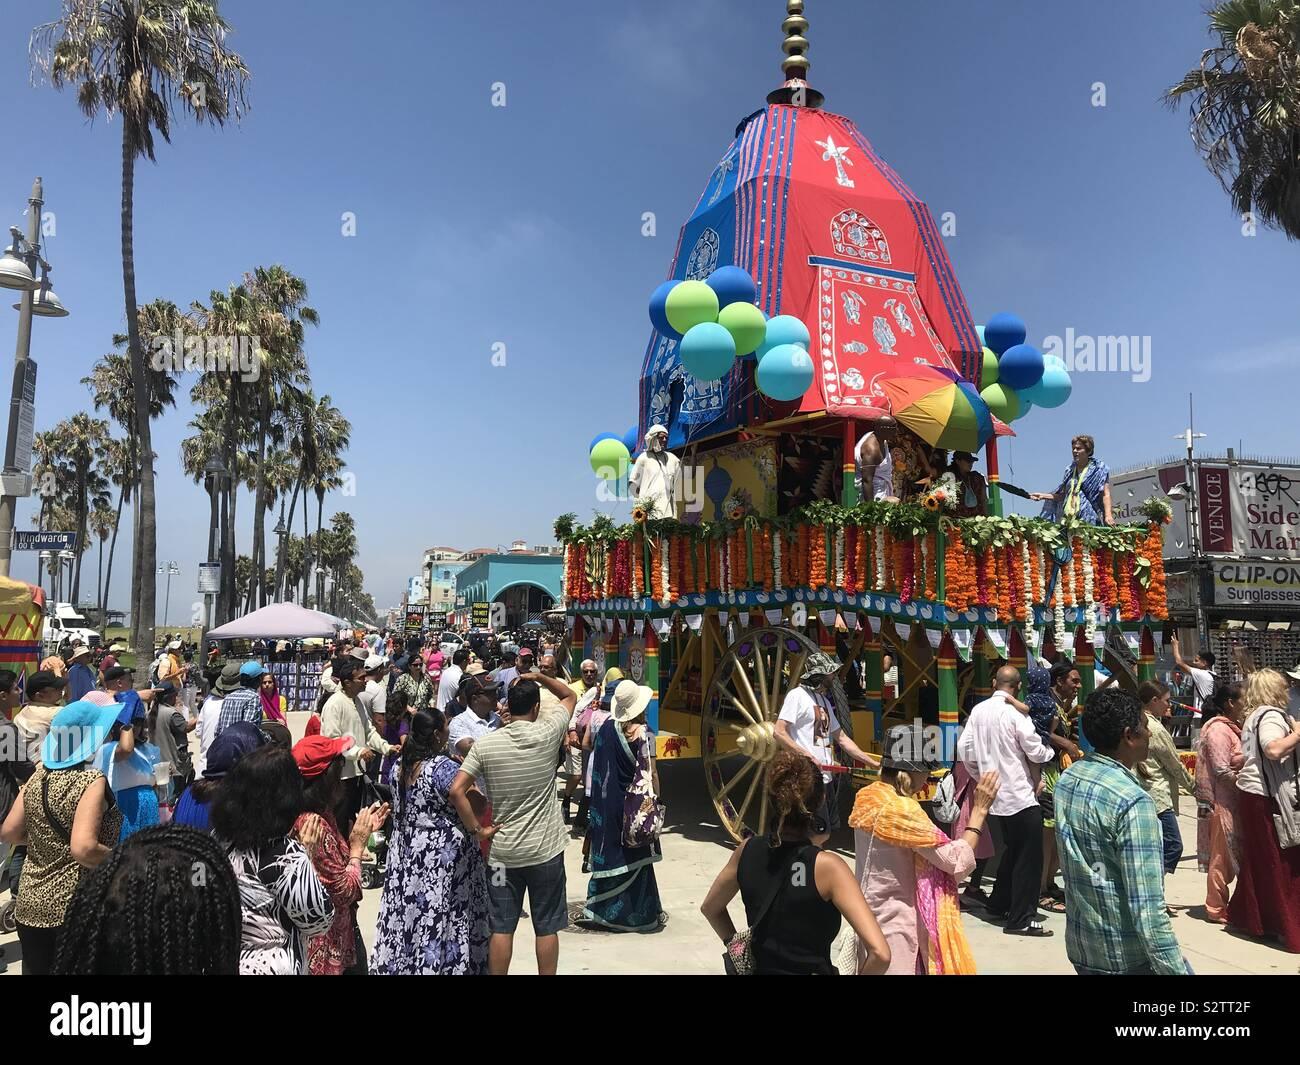 Festival der Wagen, Venice Beach, Ca Stockfoto